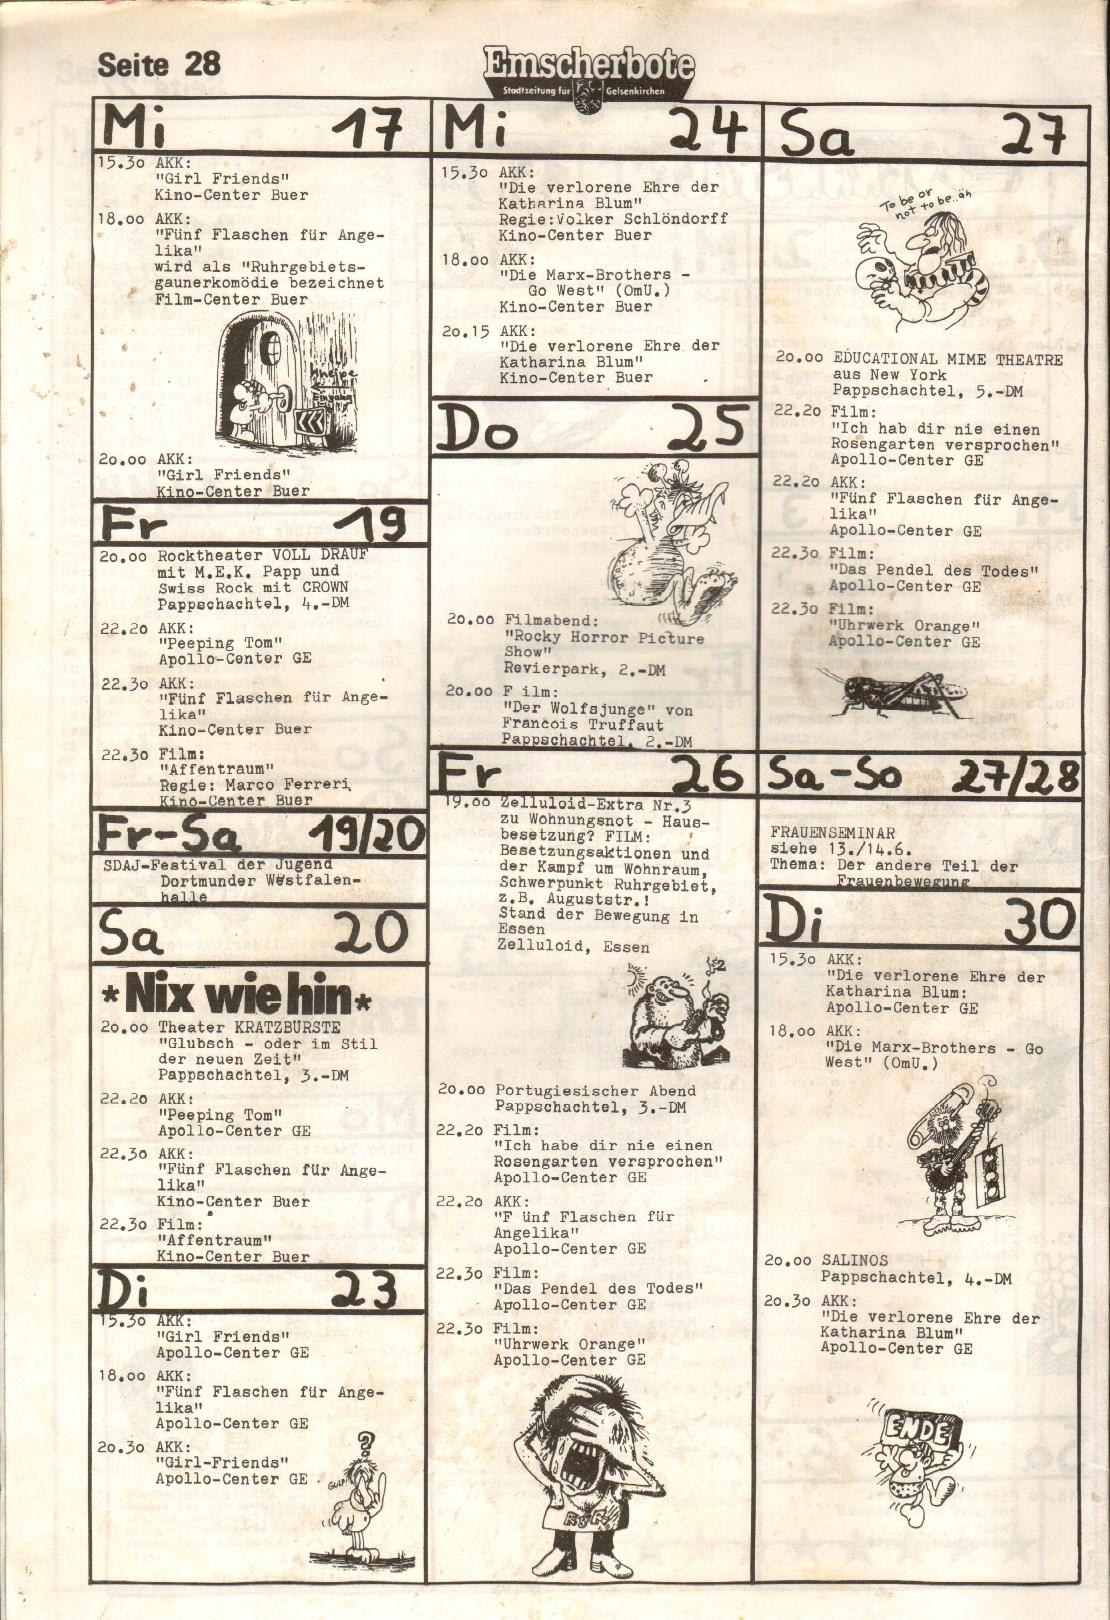 Gelsenkirchen_Emscherbote_1981_08_28